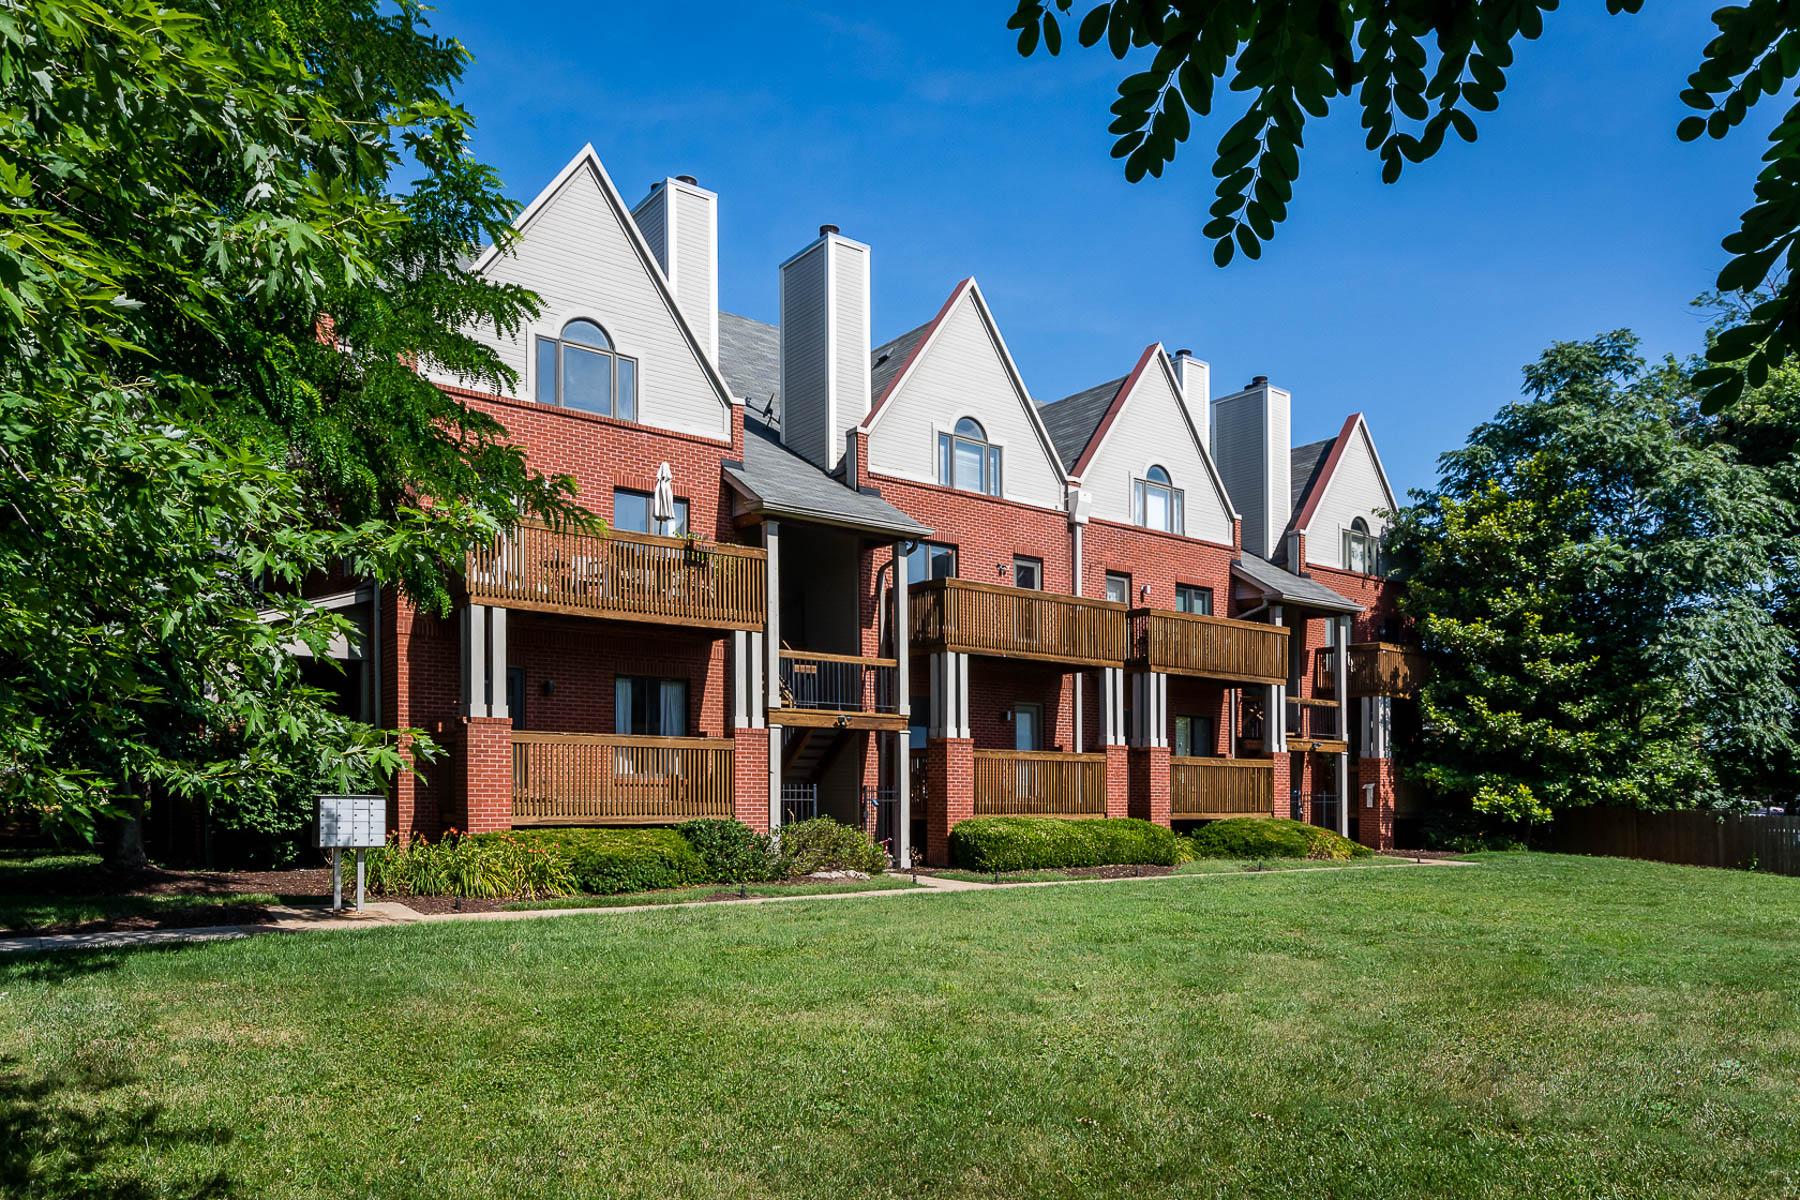 Condominium for Sale at West Pine 4111 West Pine # 12 St. Louis, Missouri, 63108 United States